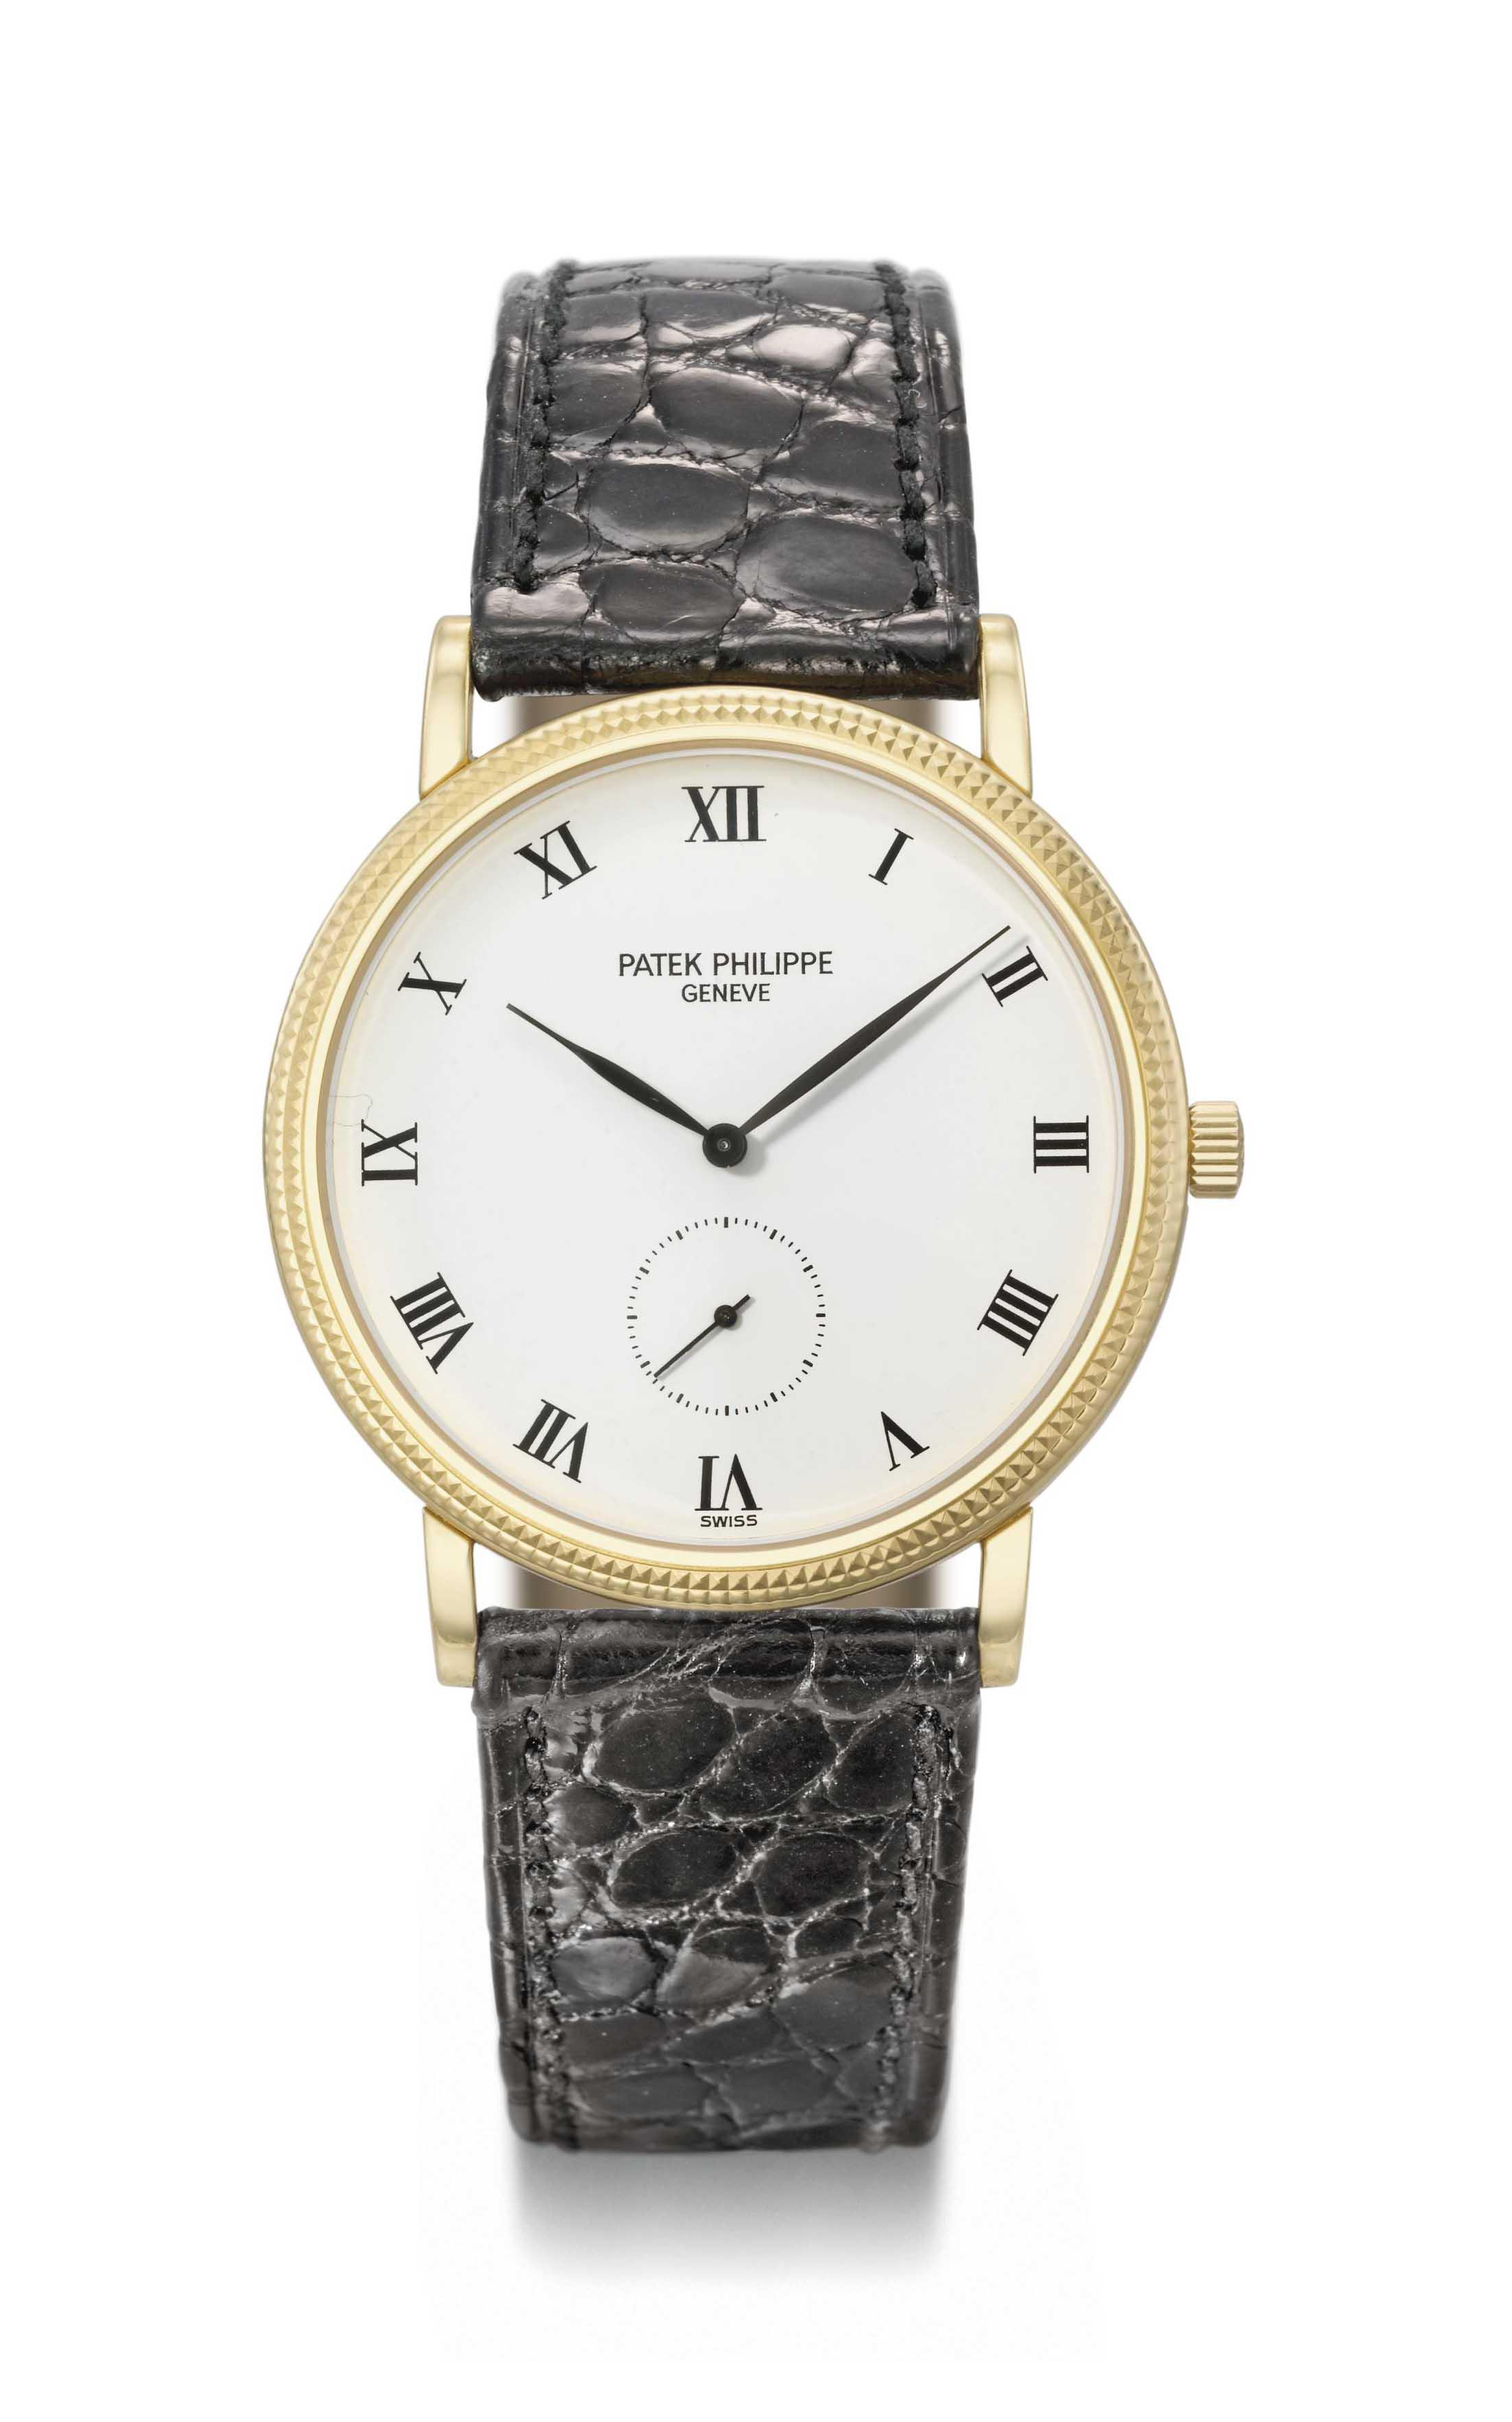 Patek philippe an 18k gold wristwatch signed patek philippe geneve calatrava model ref for Patek philippe geneve